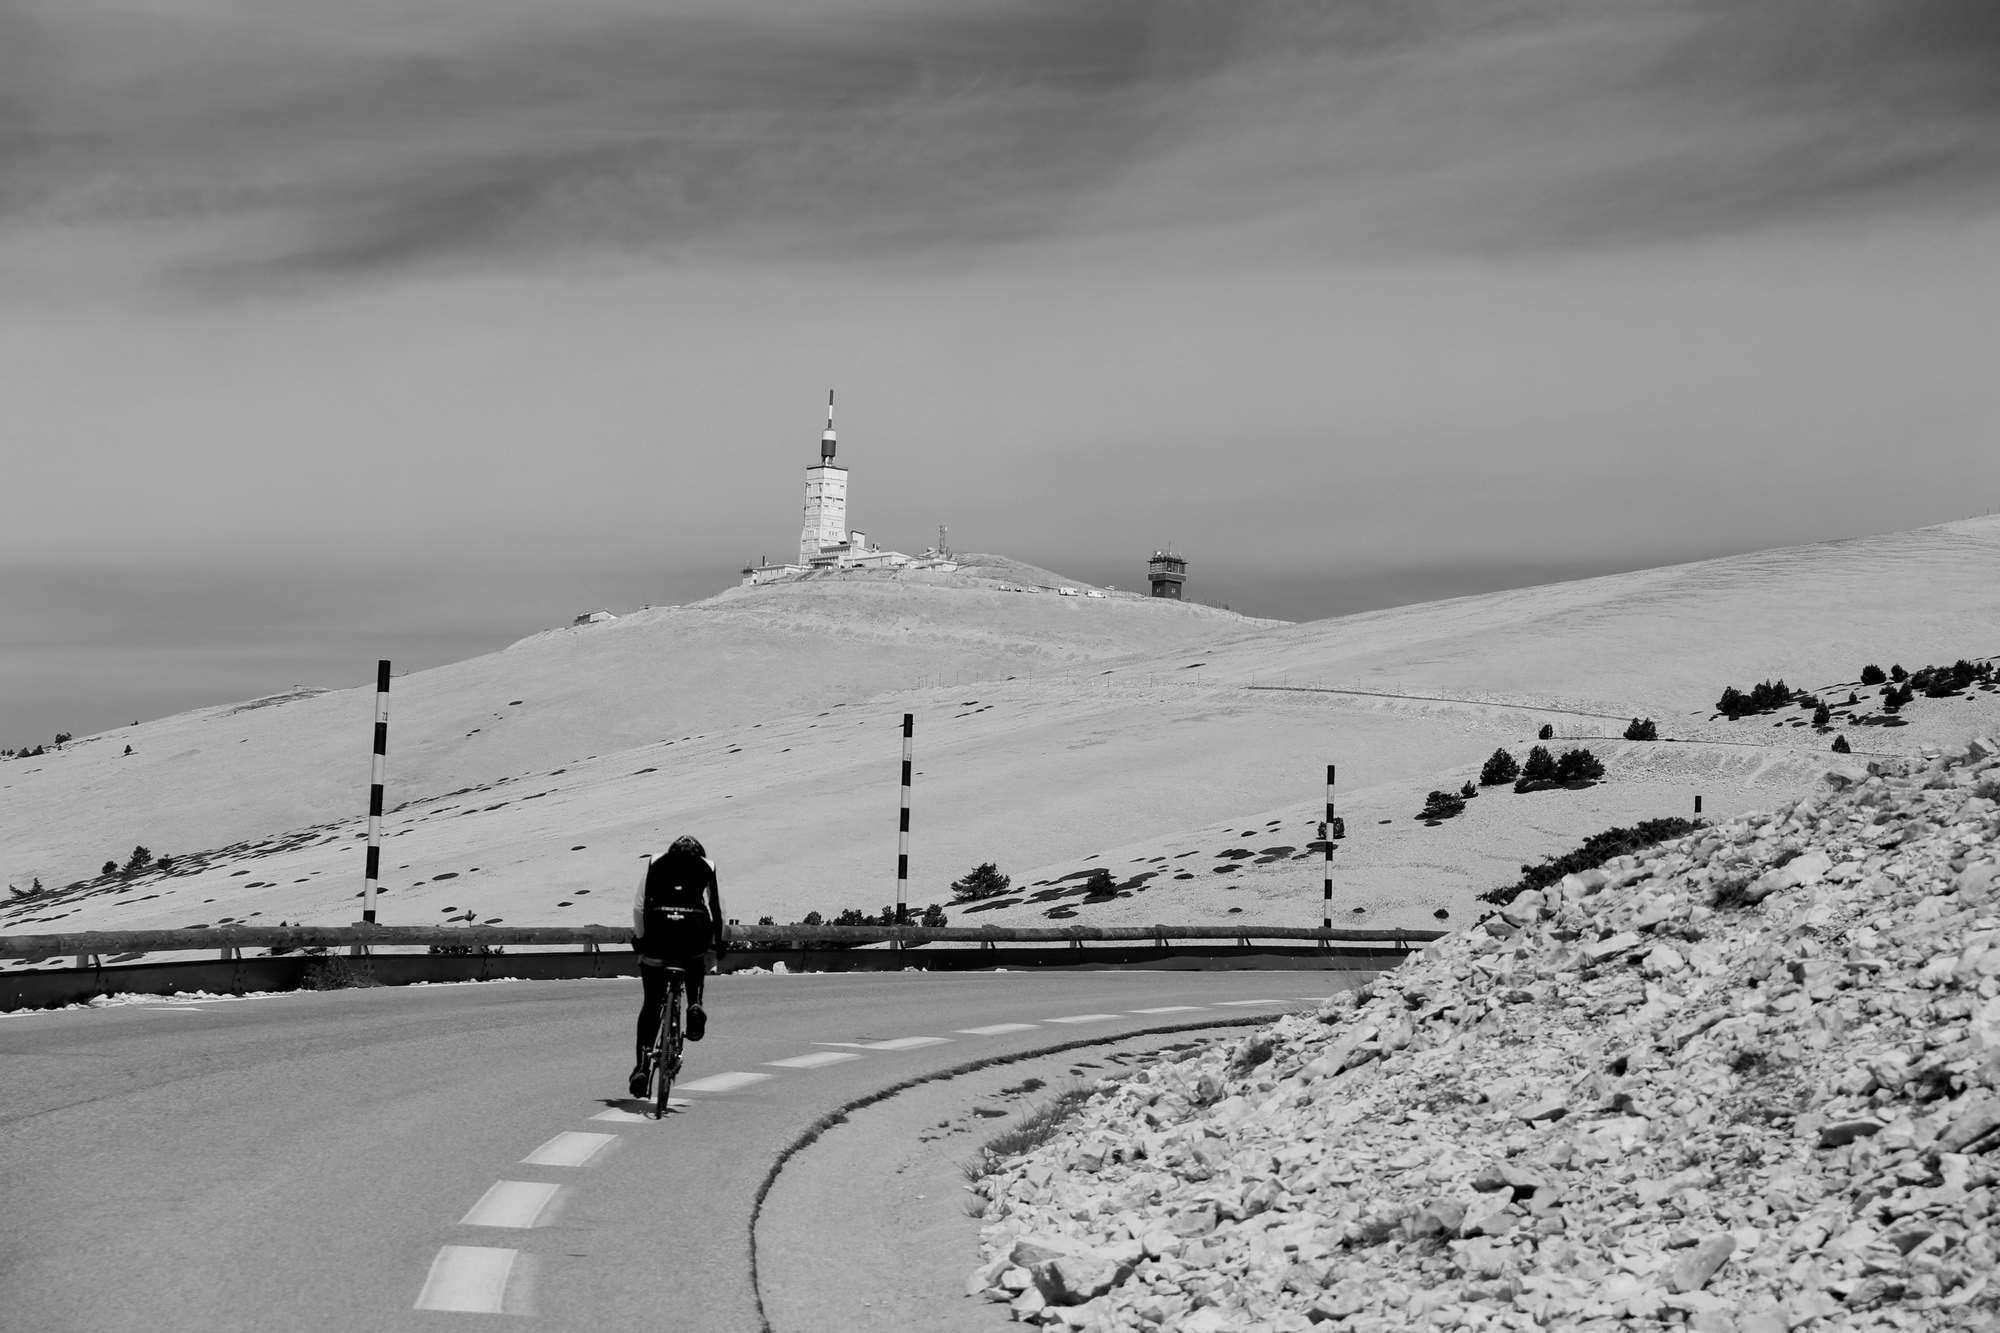 De mythe van midlife mountain